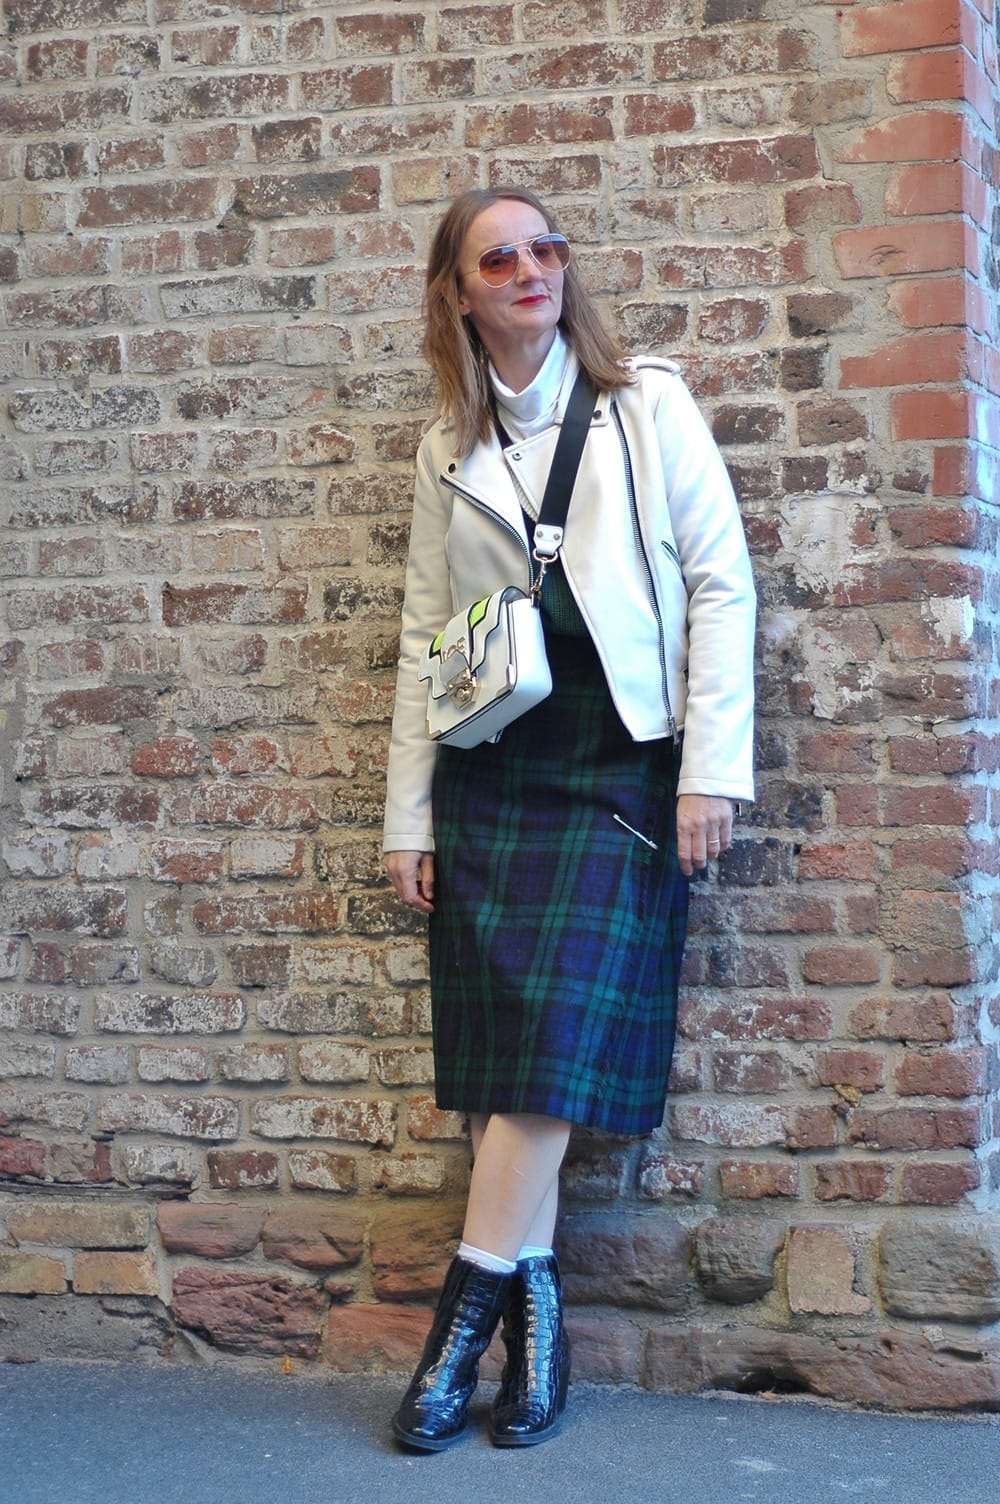 karo-Schottenrock_lederjacke_cowboy-boots_cross-body-bag-weiss_iceberg_oceanblue-style-mode-blog_frau_ü50 (15)-01